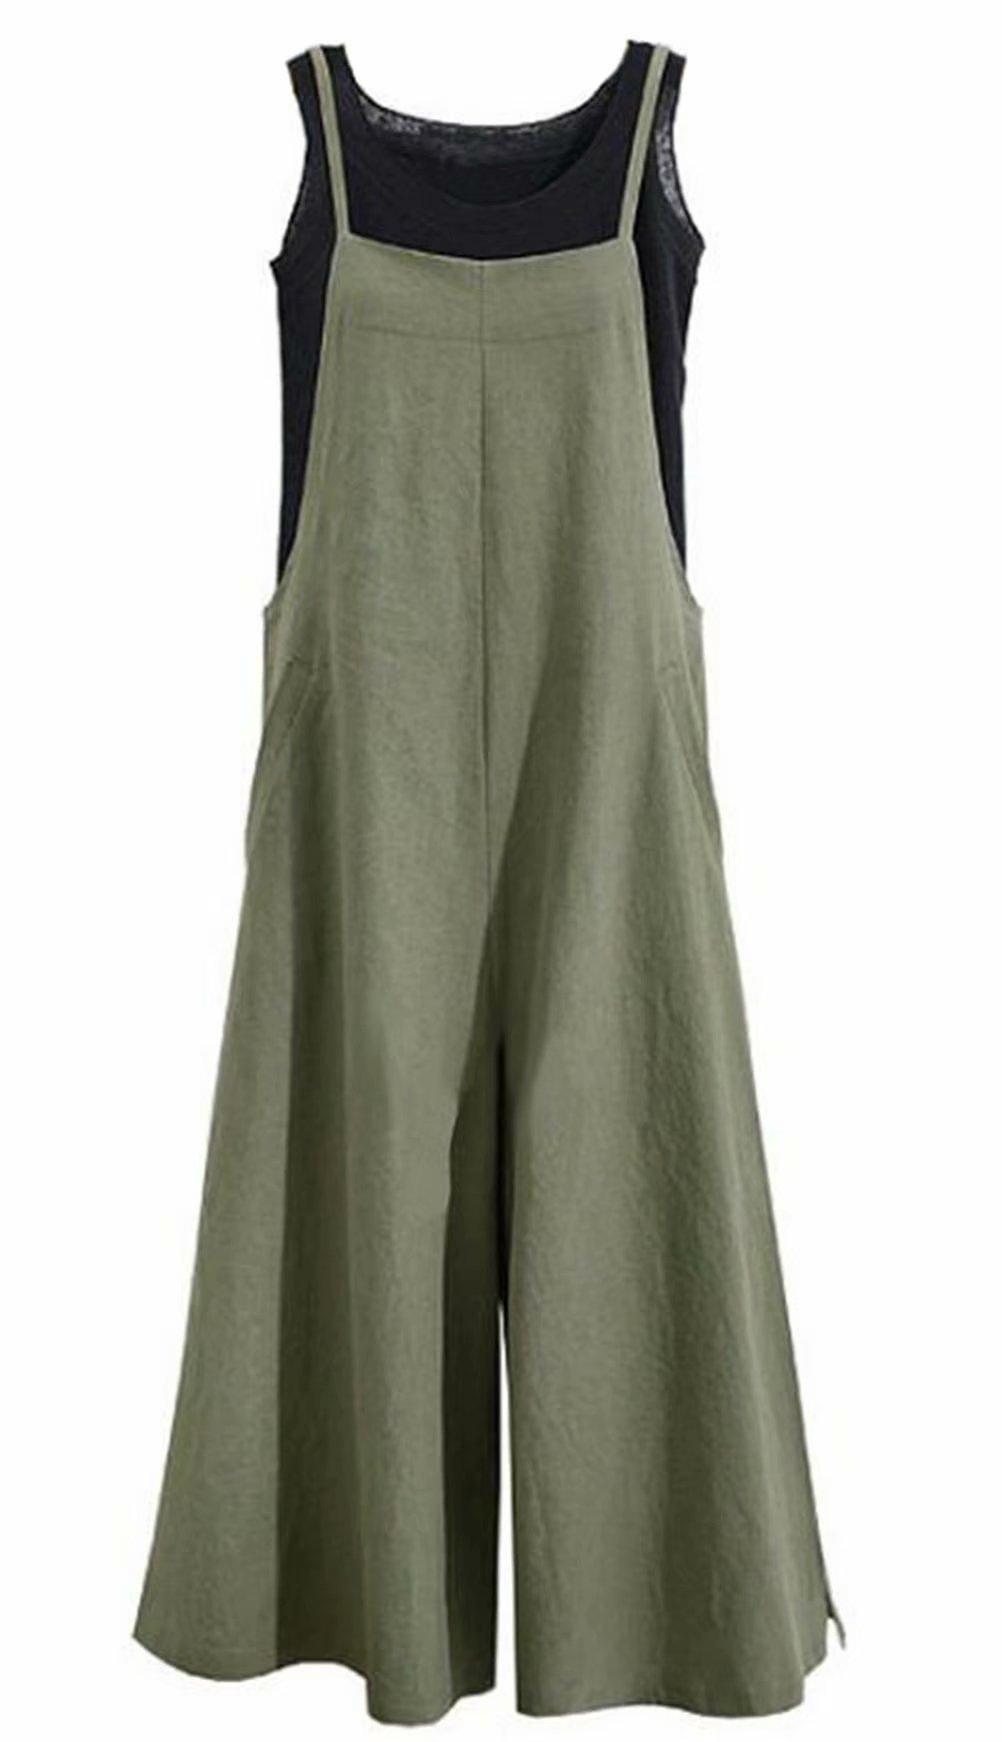 MAXIMGR Women's Plus Size Casual Cotton Suspender Jumpsuit Long Twin Side Bib Wide Leg Overalls Size L (Green)